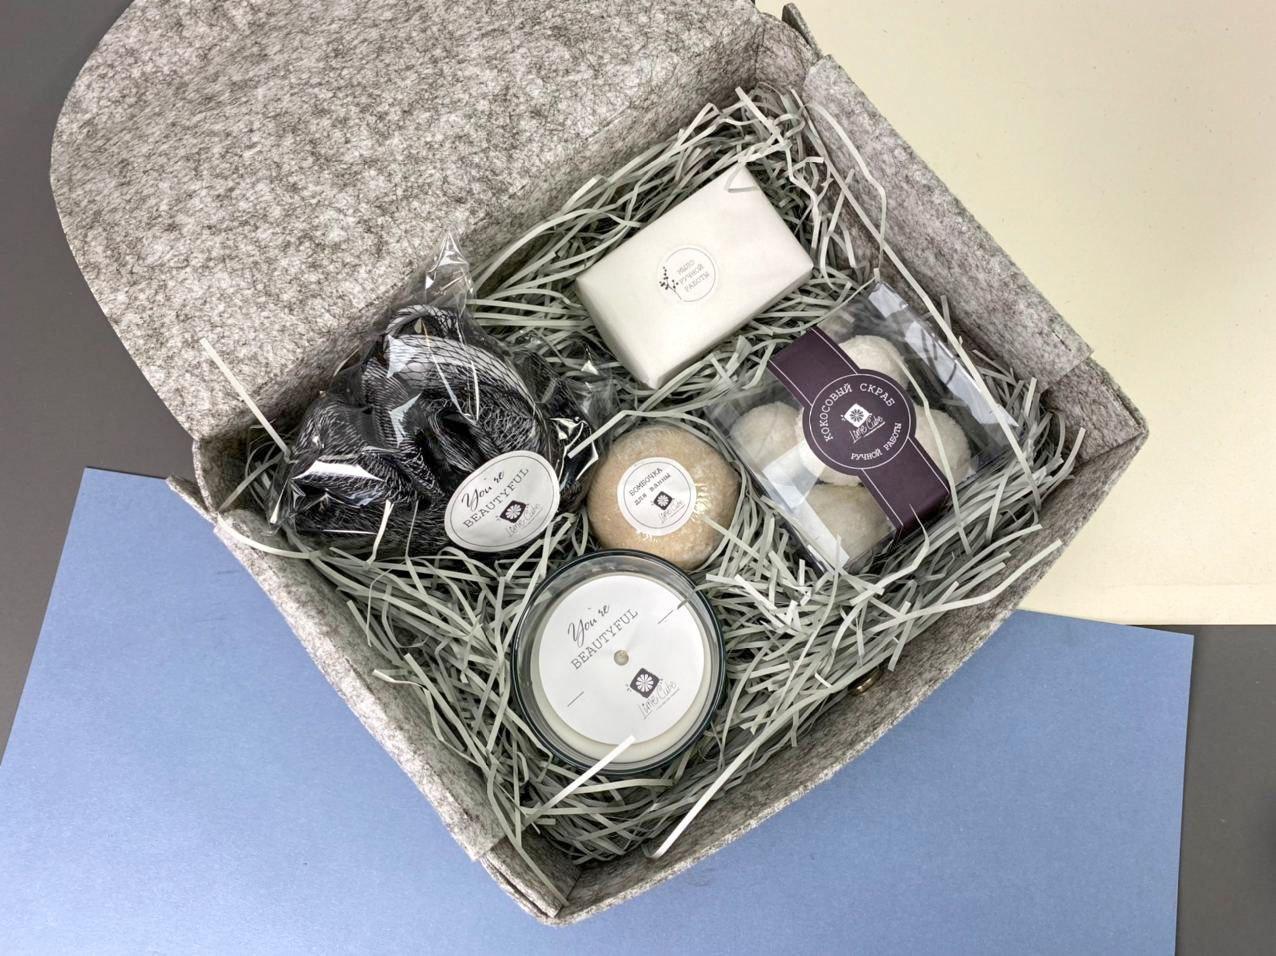 Подарочный набор для ванны Будуар